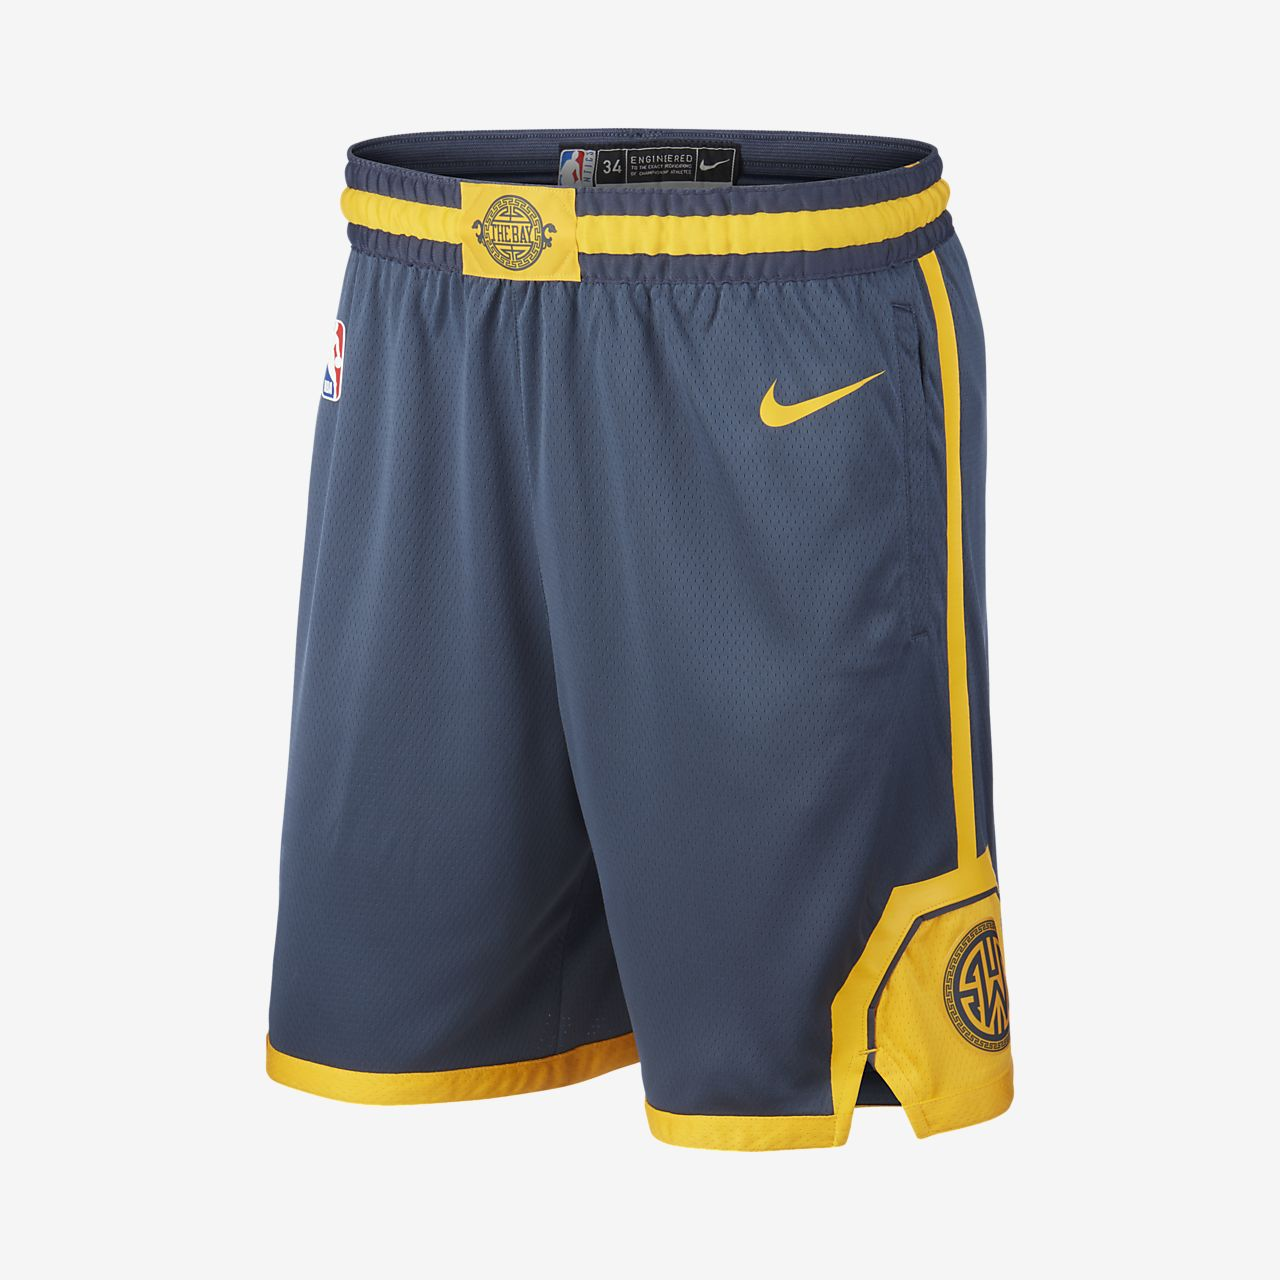 42f891fdd3c Golden State Warriors City Edition Swingman Men s Nike NBA Shorts ...